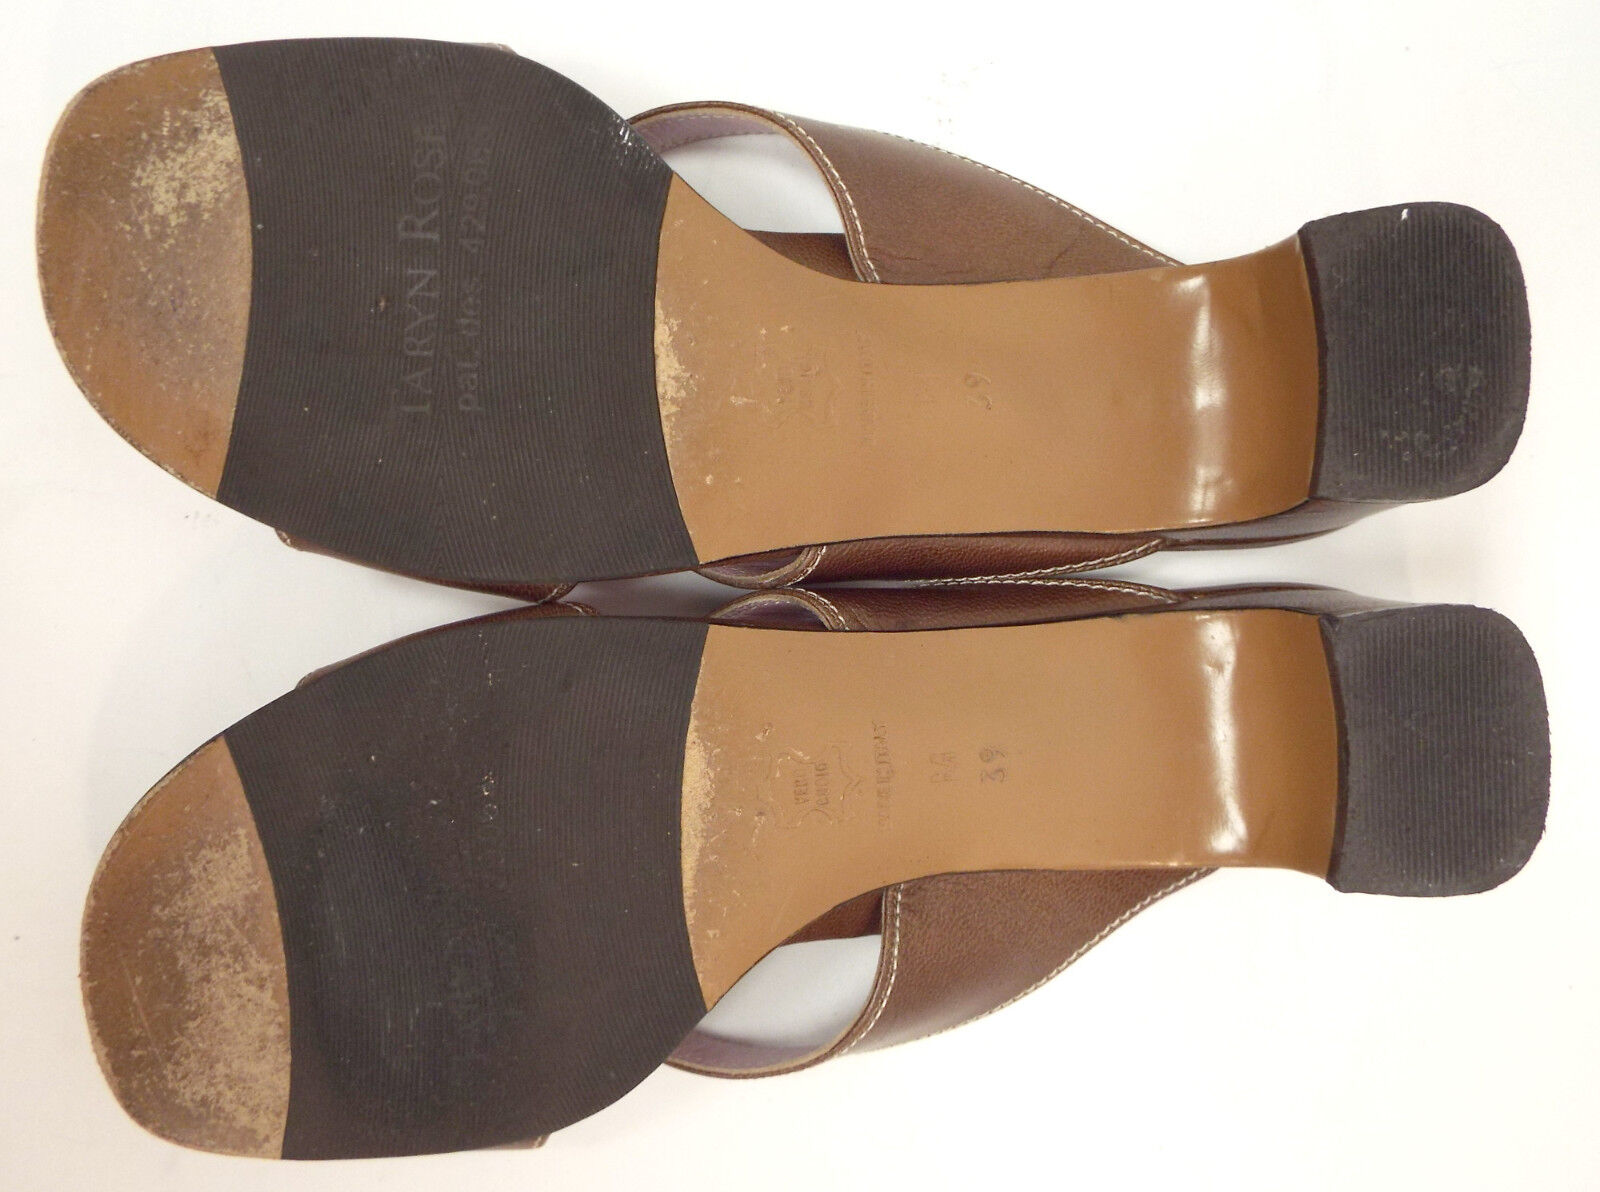 Original Braun TARYN ROSE Größe 8.5 Braun Original Cross Strap Slide Sandales Schuhes 39 47d699